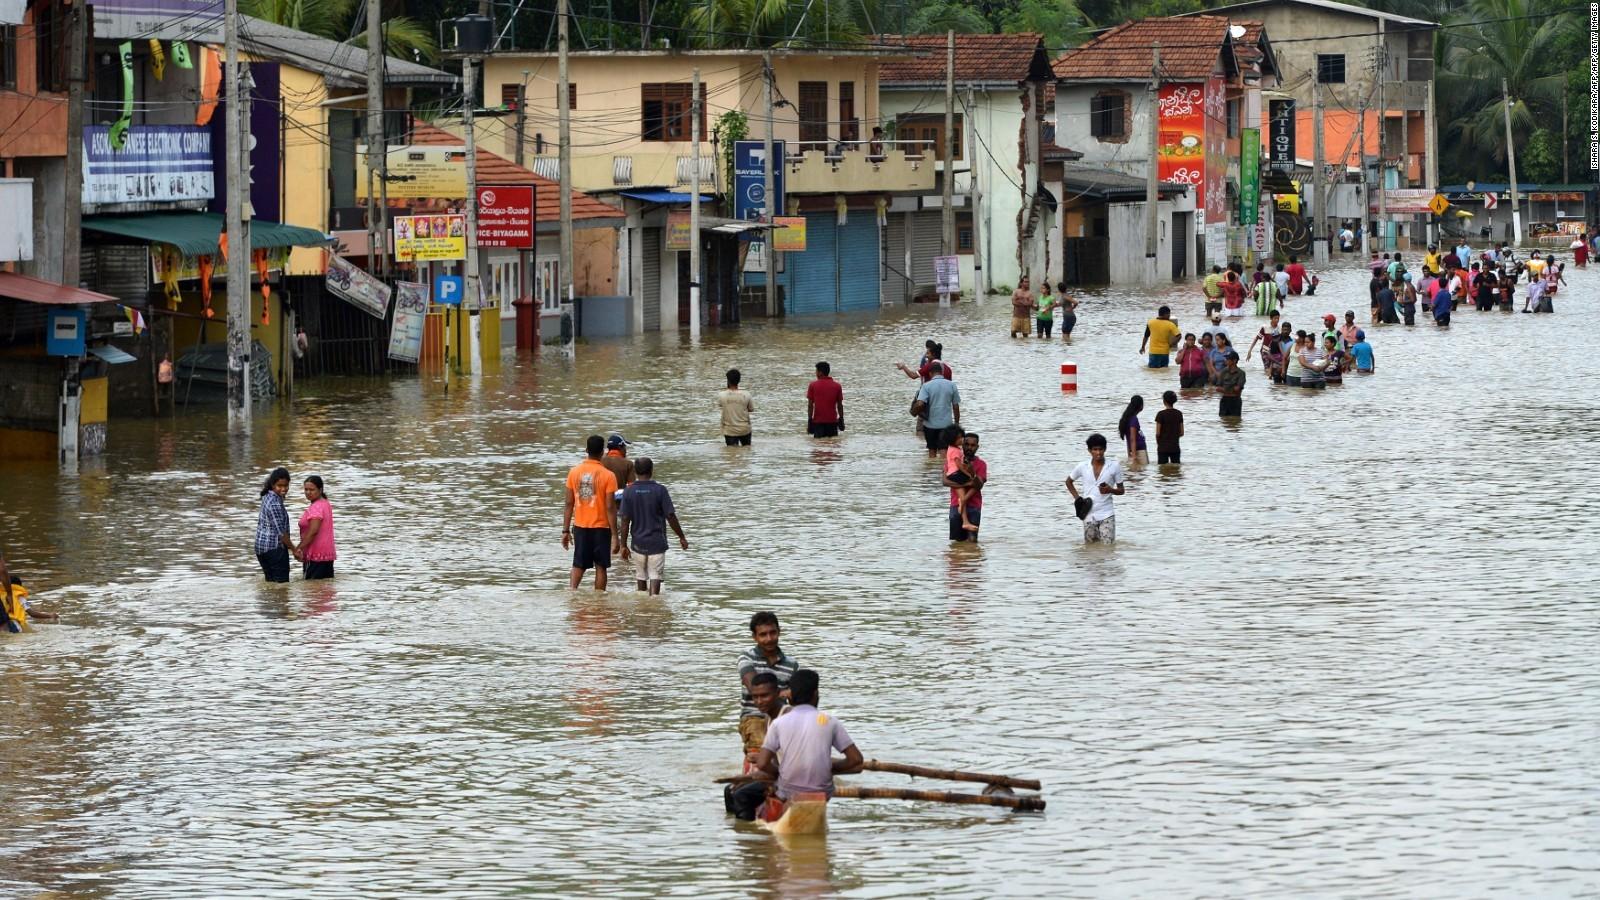 बाढीबाट दक्षिणी श्रीलंकामा आठ हजार स्थानीय प्रभावित